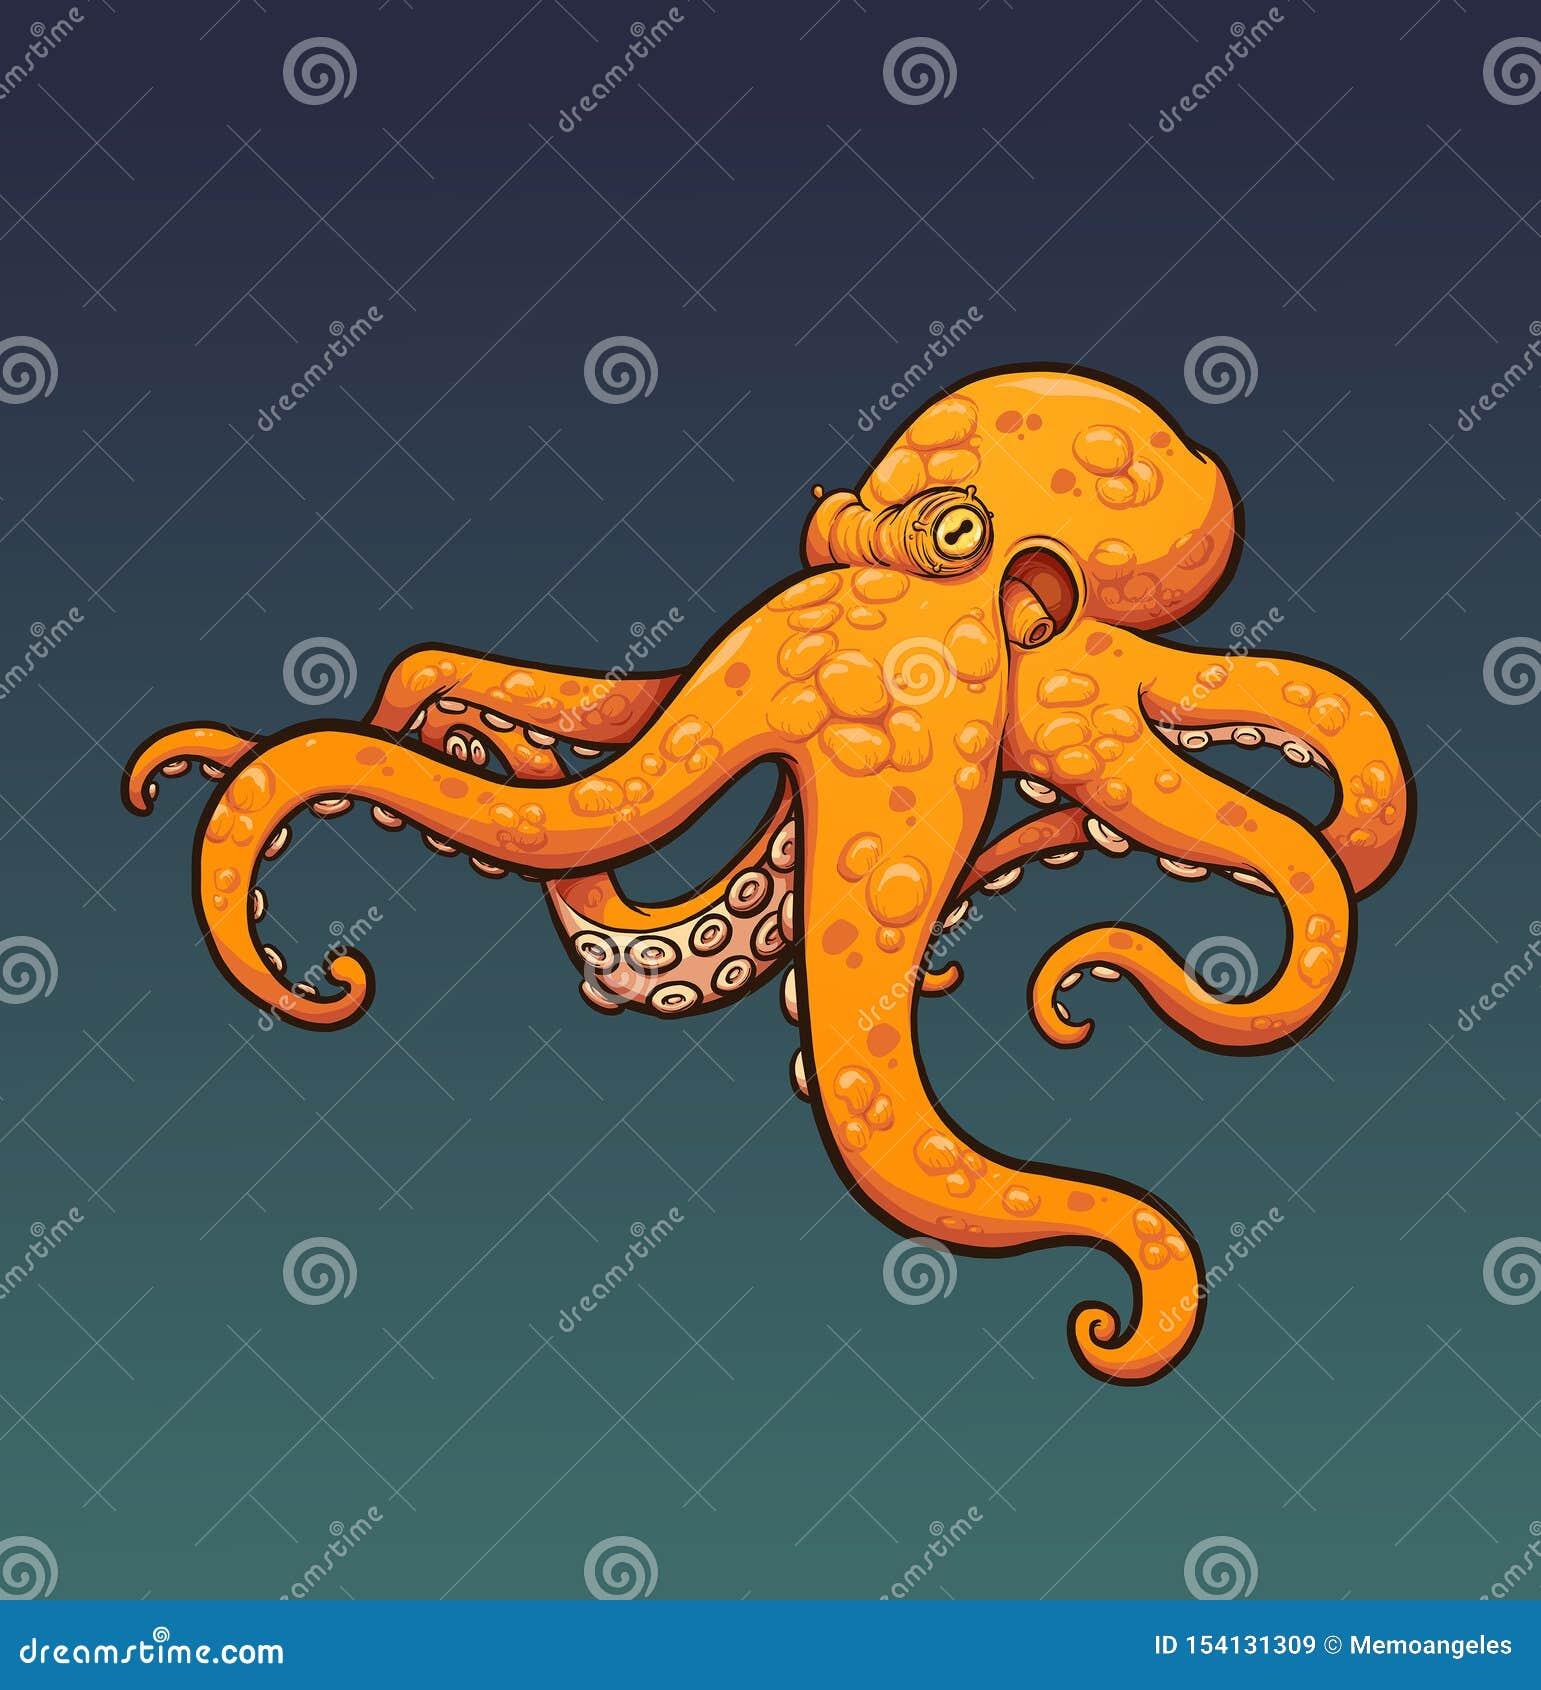 Blue octopus stock illustration. Illustration of pink - 37705553